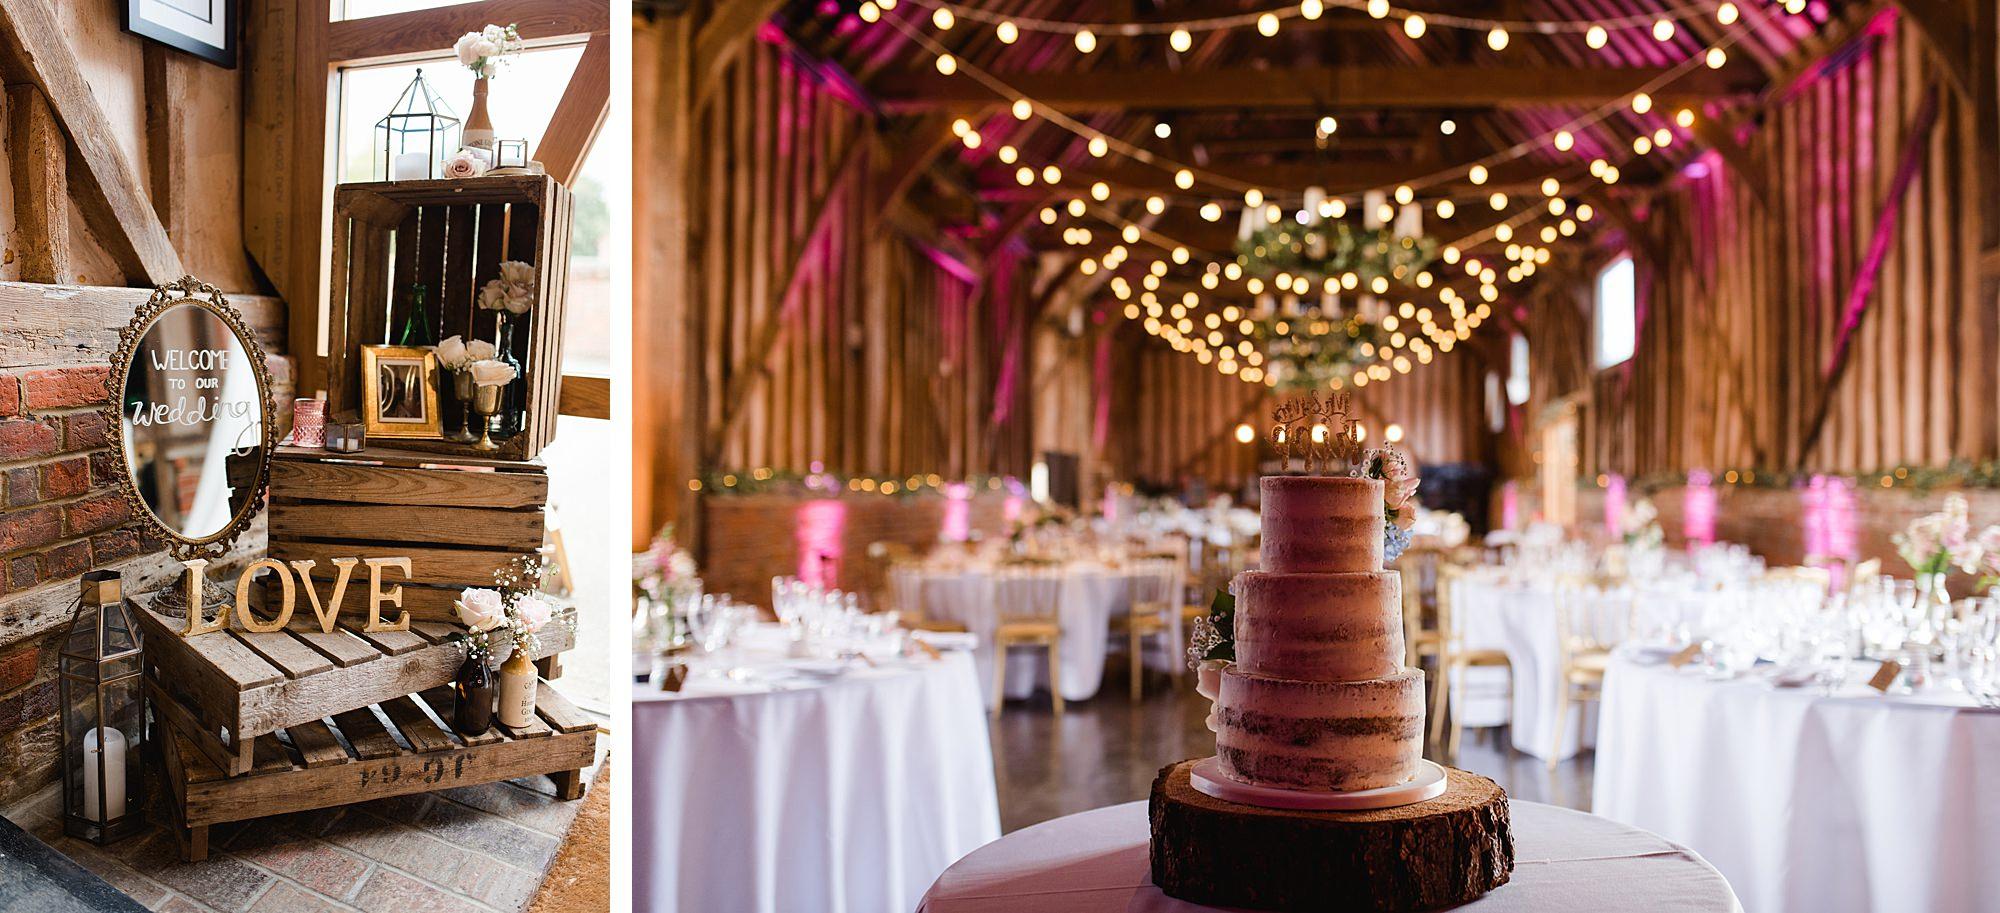 Lillibrooke Manor wedding decoration